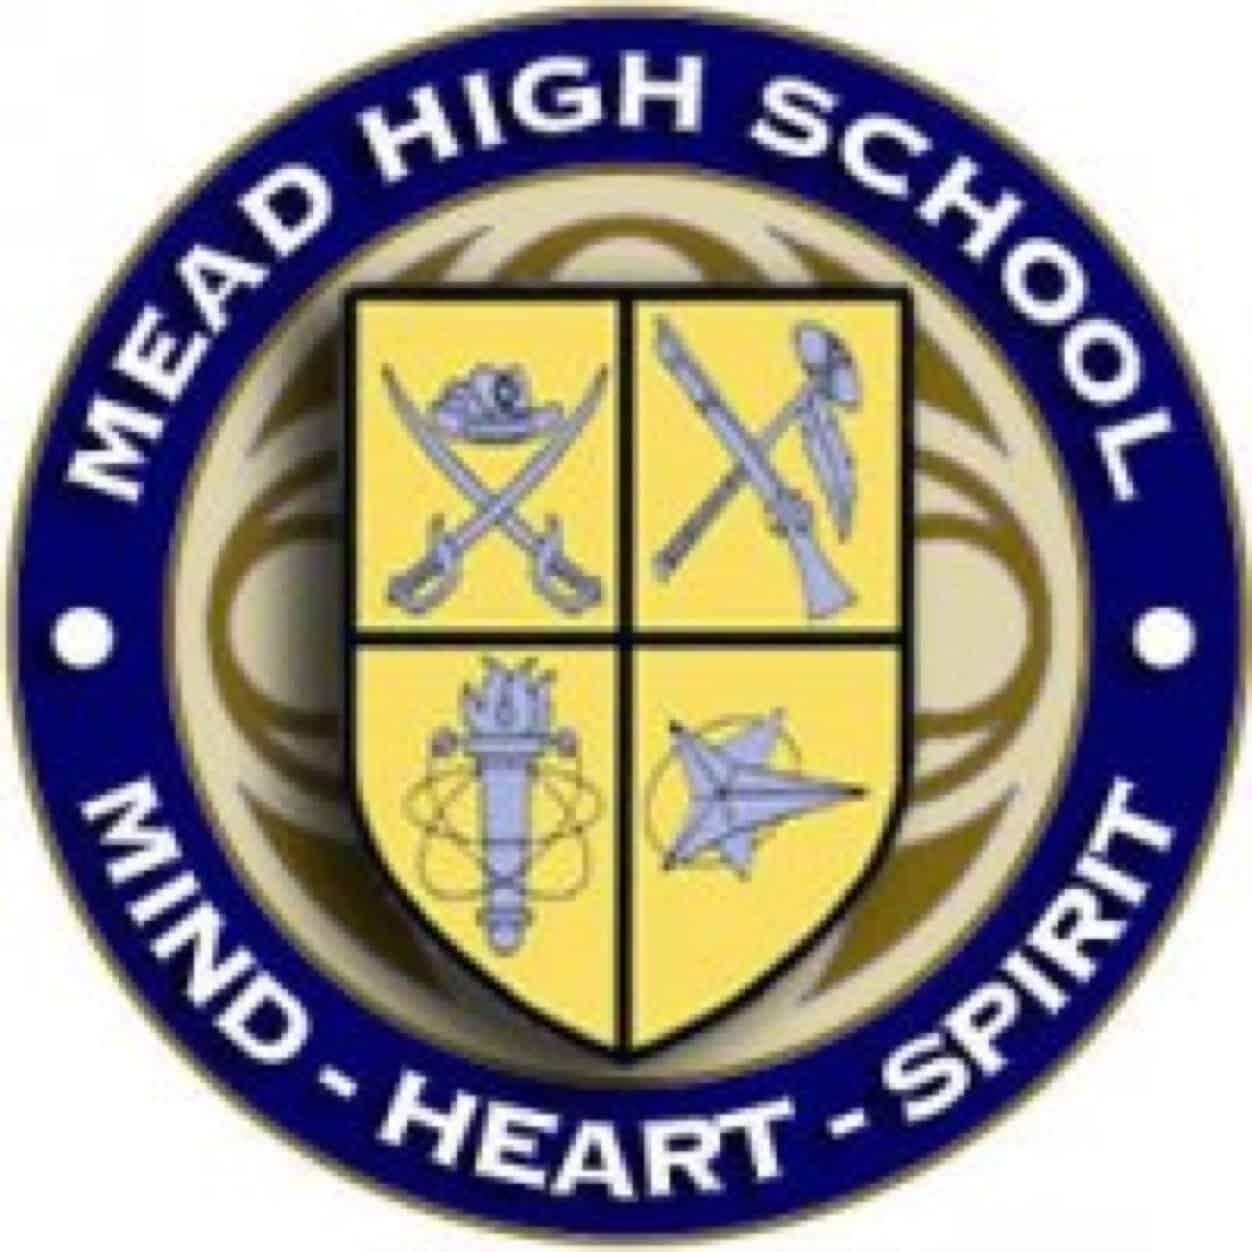 mead_high_school.jpg